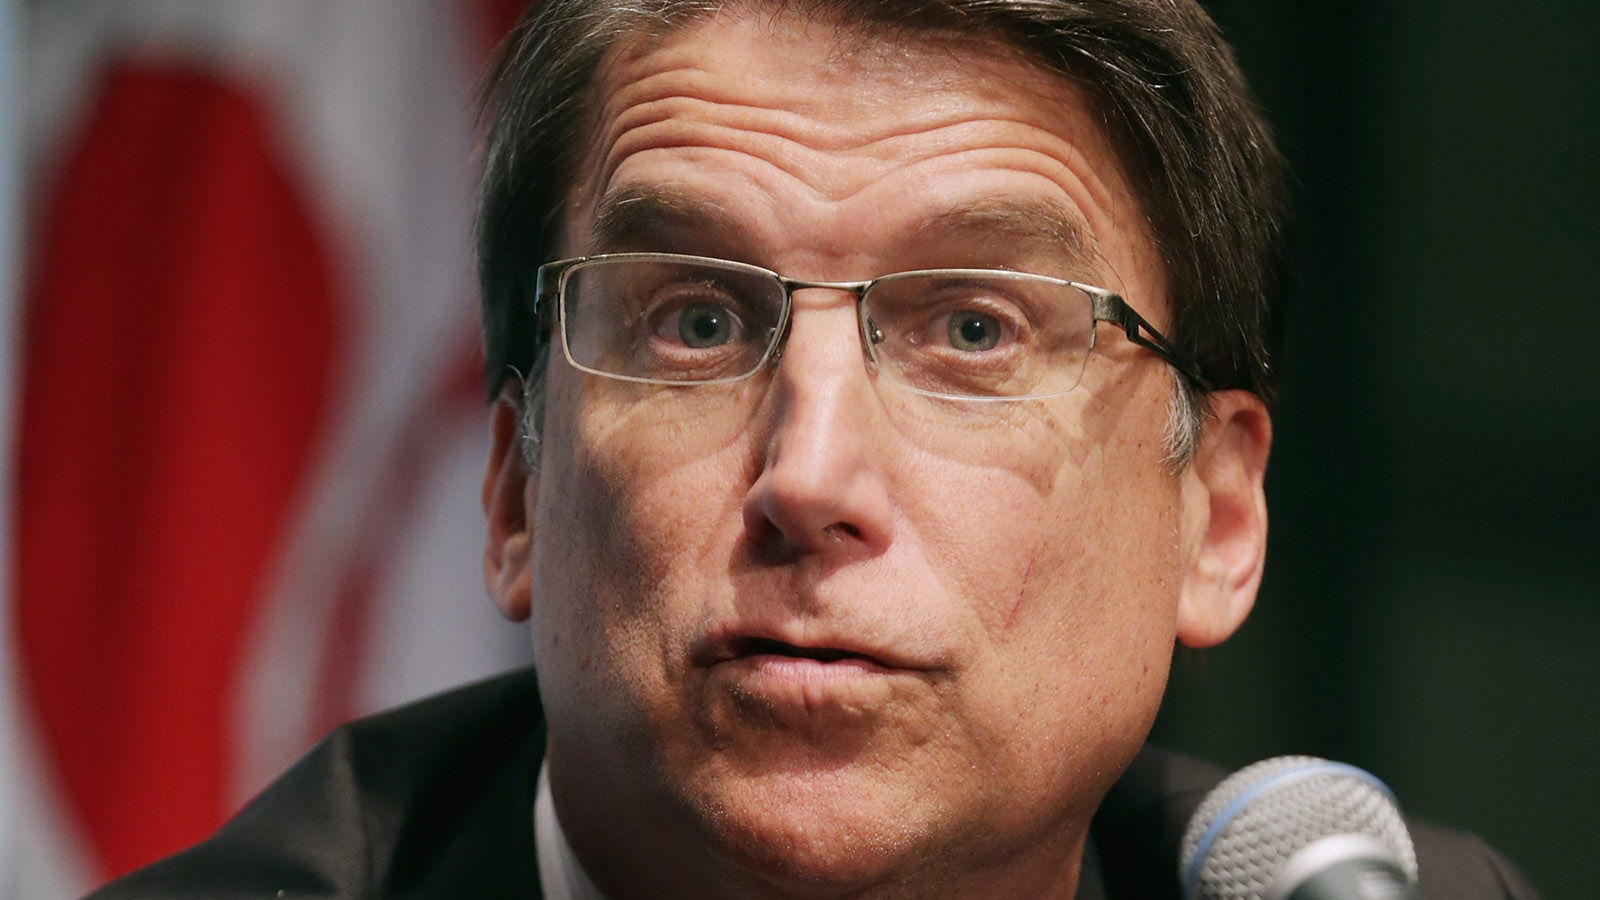 Former North Carolina Gov. Pat McCrory will soon launch Senate campaign